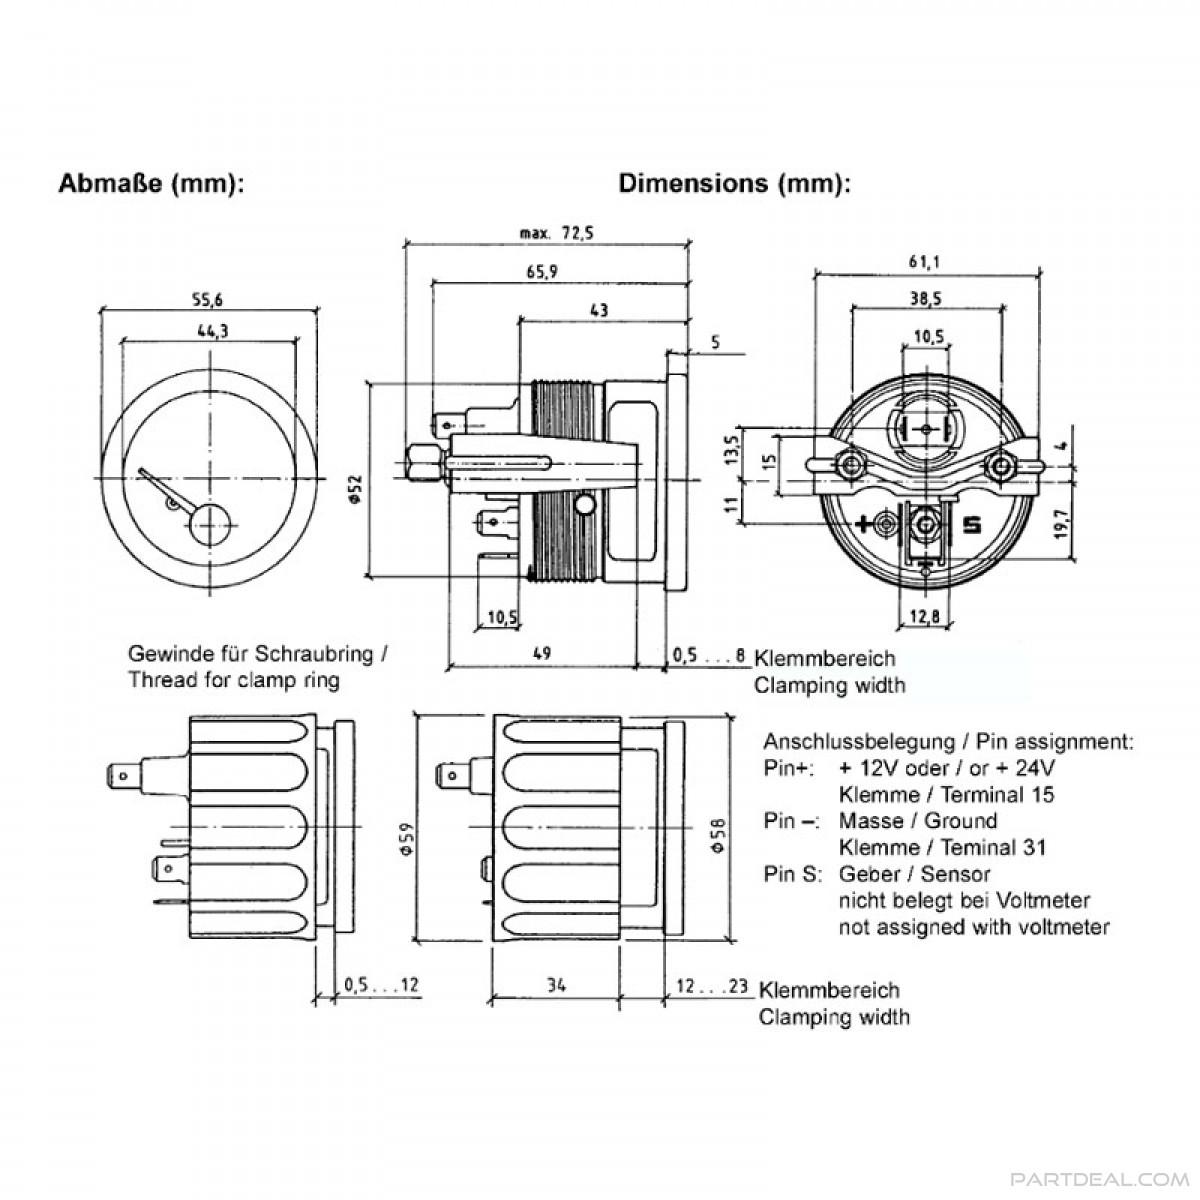 Vdo Voltmeter Wiring Data Wiring Diagram